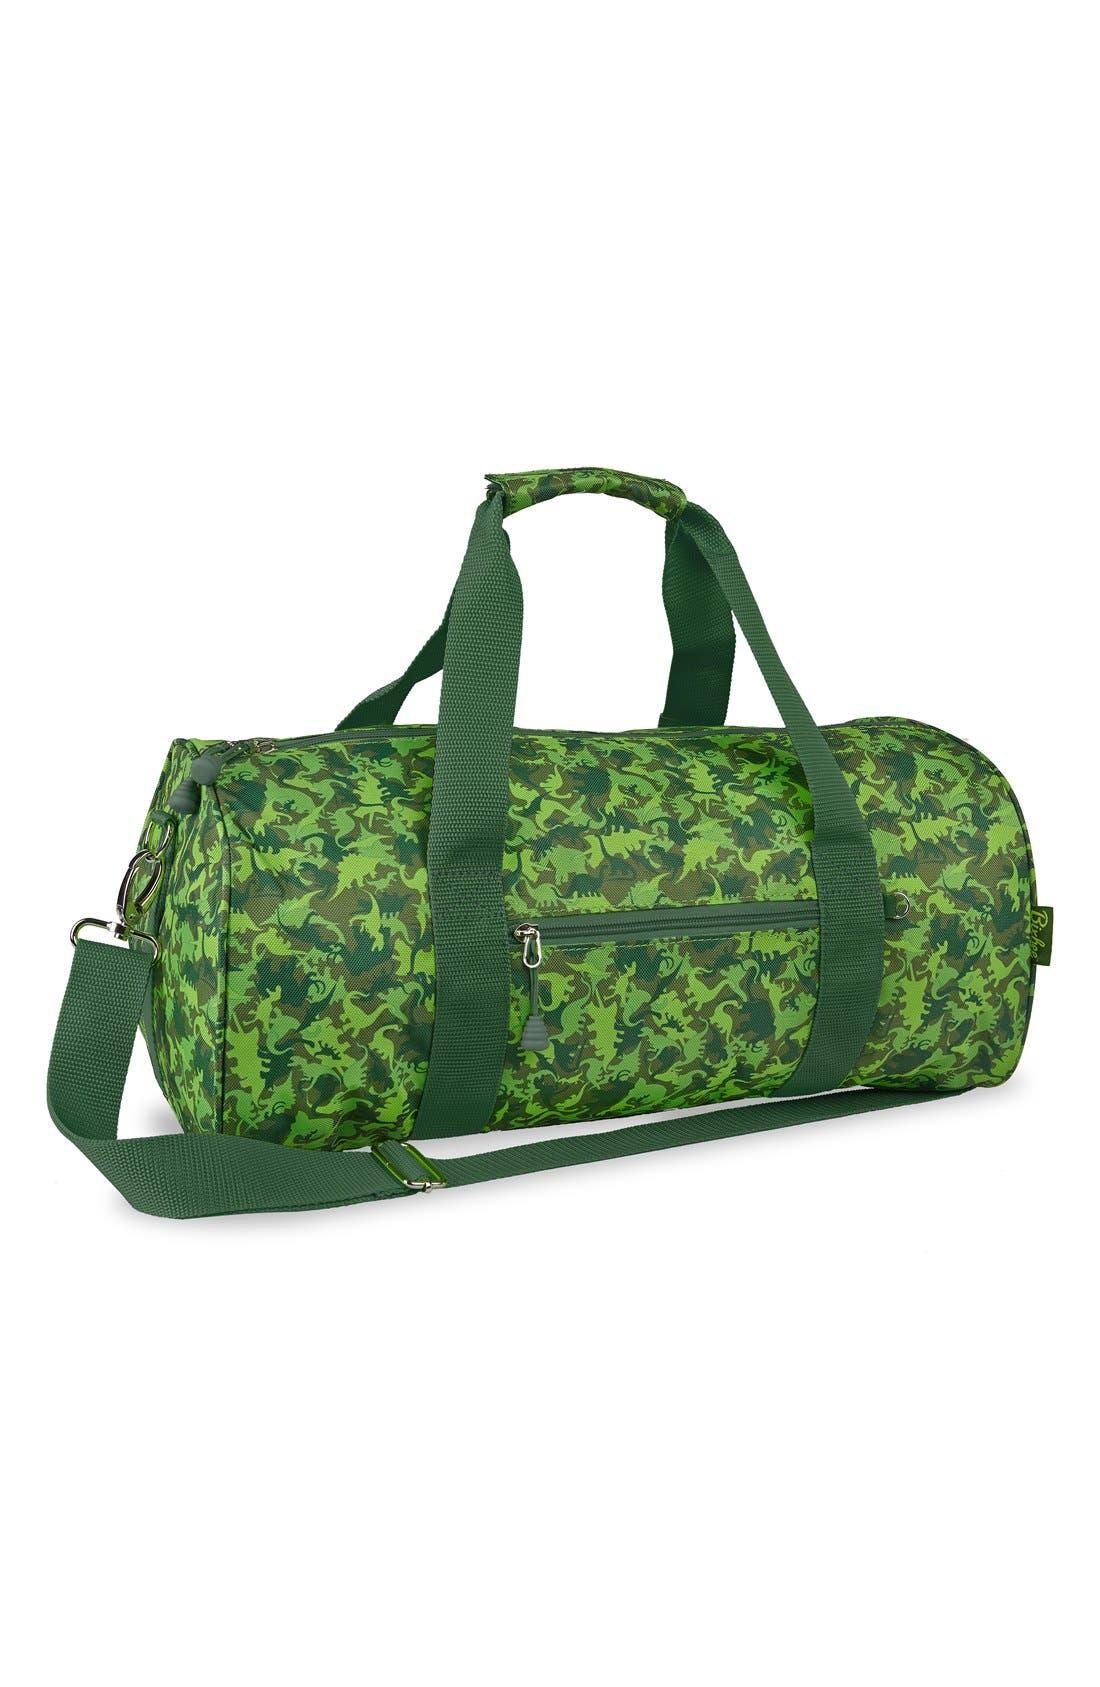 'Large Dino Camo' Sports Duffel Bag,                             Main thumbnail 1, color,                             300